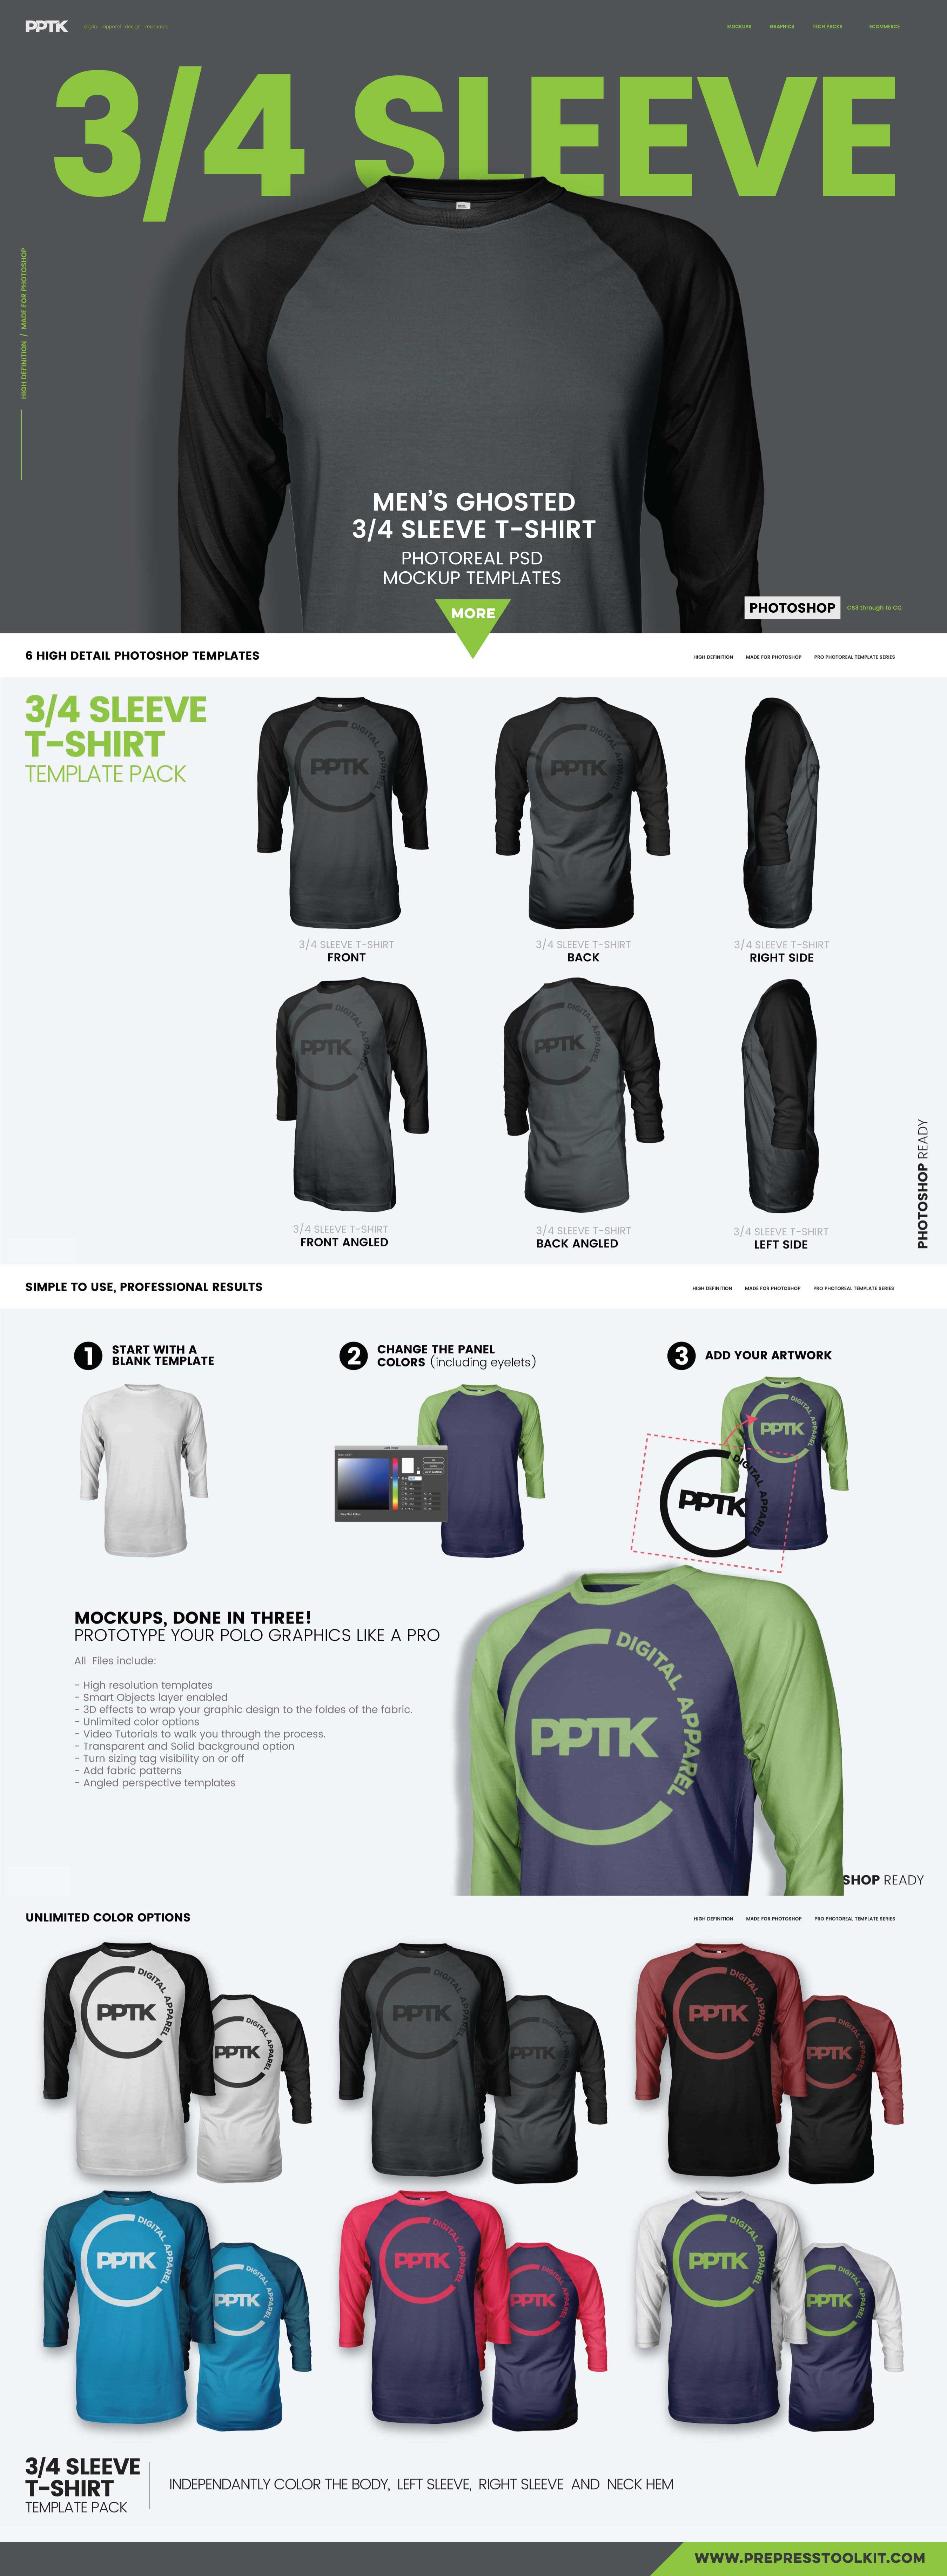 Raglan 3 4 sleeve t shirt template product mockups for 3 4 sleeve shirt template